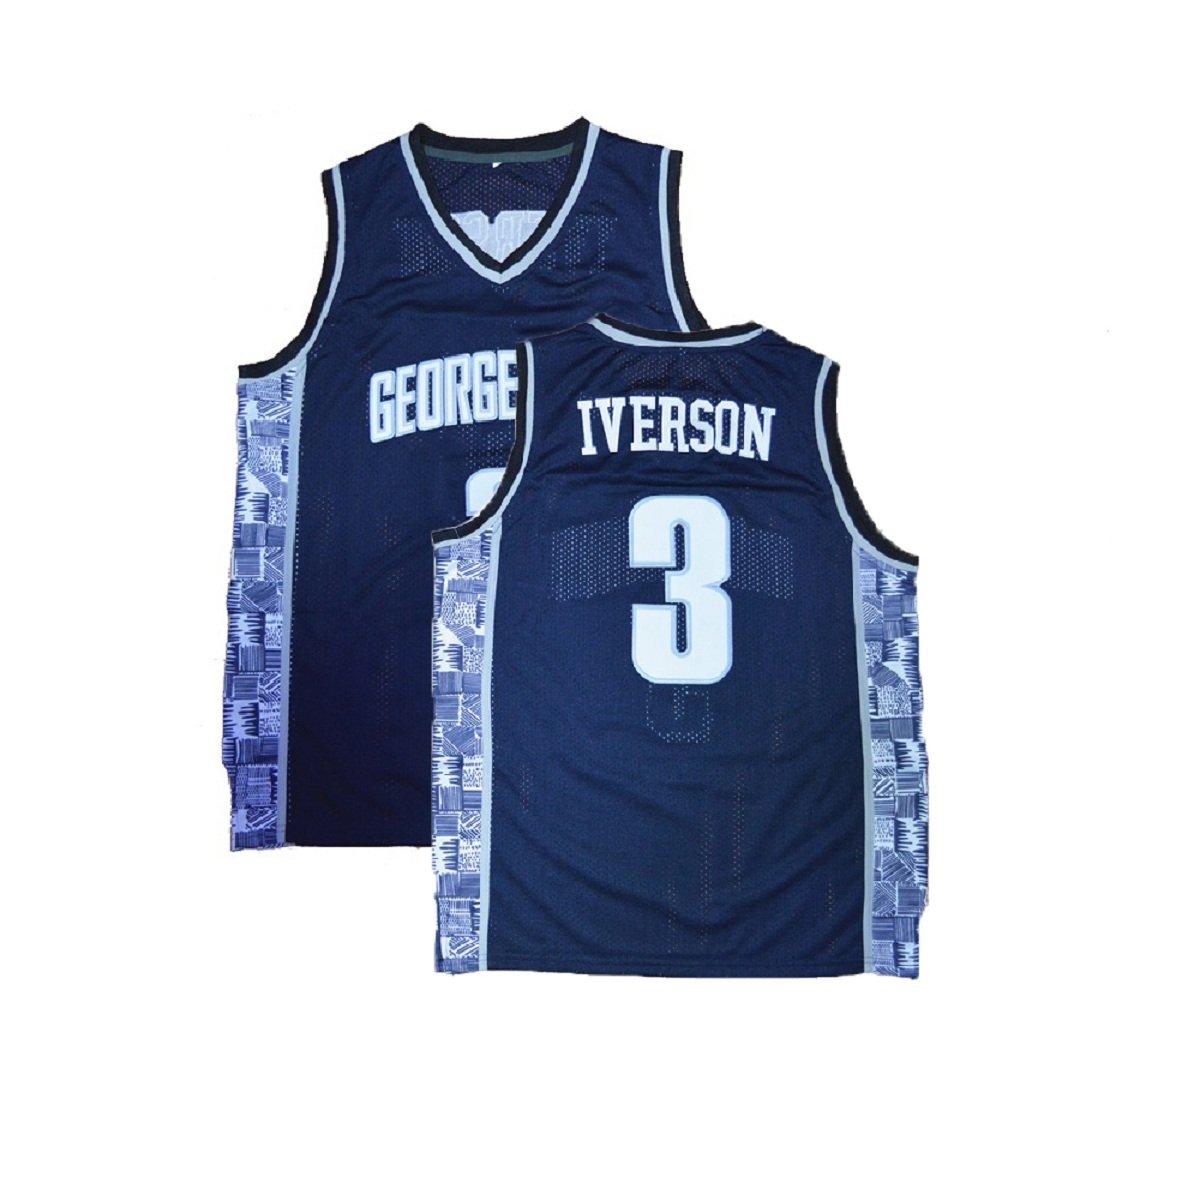 cda9691a1 Amazon.com  Men s Allen Retro Jerseys Iverson Athletics Jerseys The  University Basketball  3 Jersey Blue (S-XXL)  Clothing .